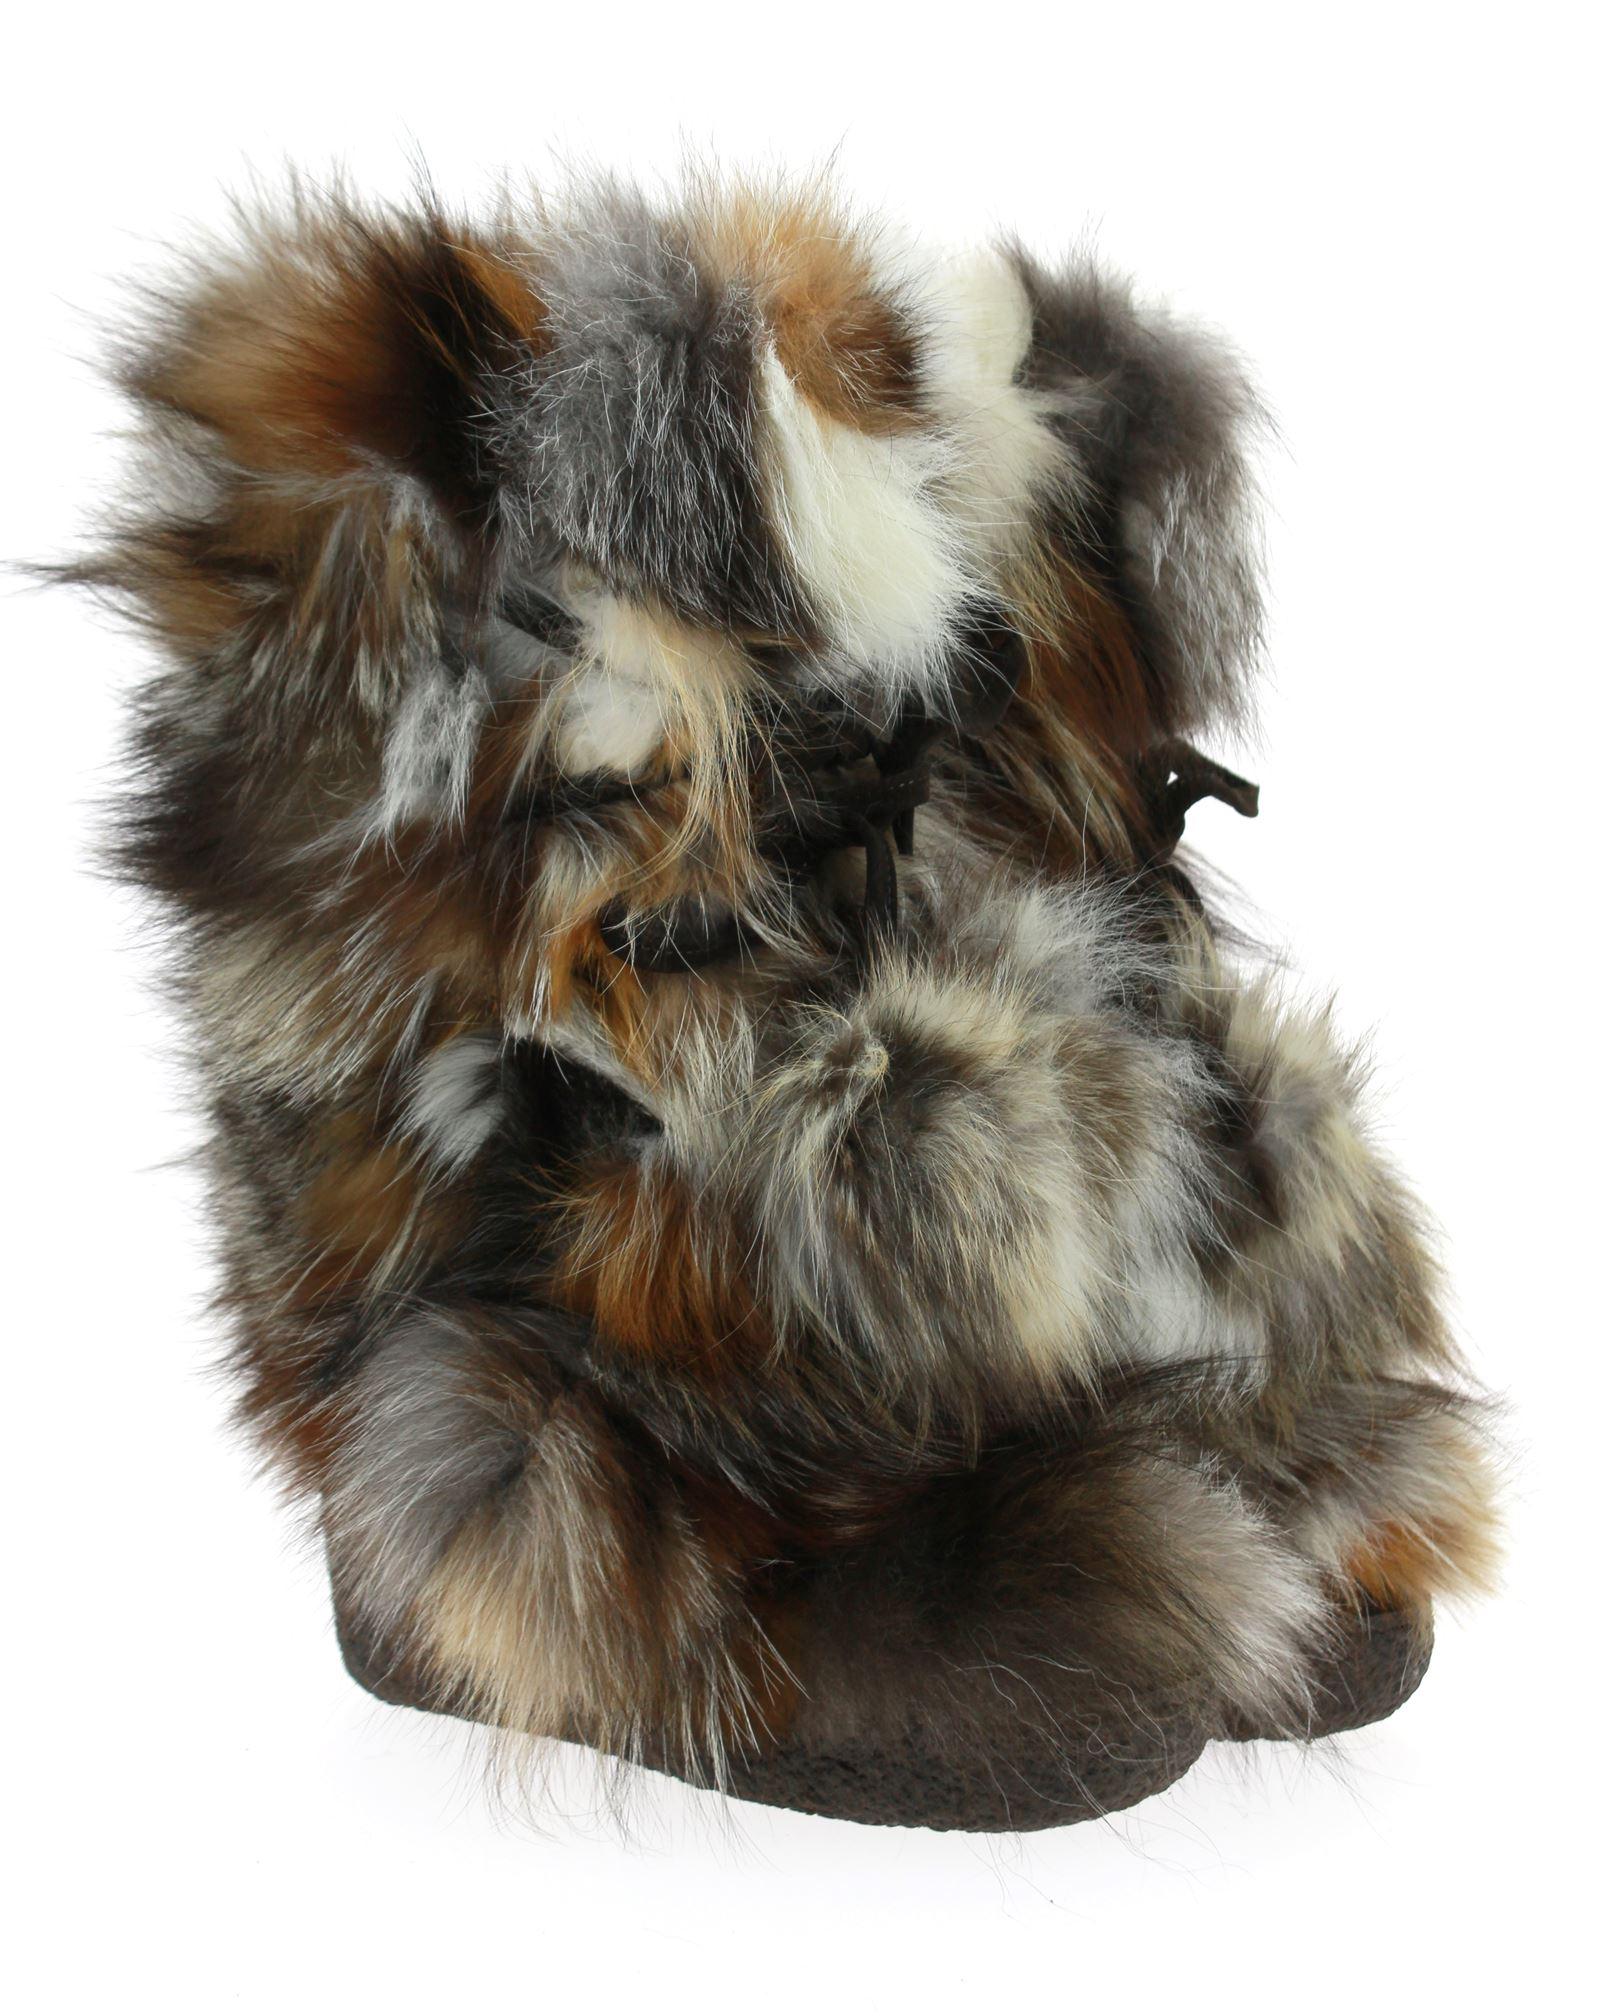 Diavolezza Fur Boots MIX BEIGE FOX POM POM Fox Fur